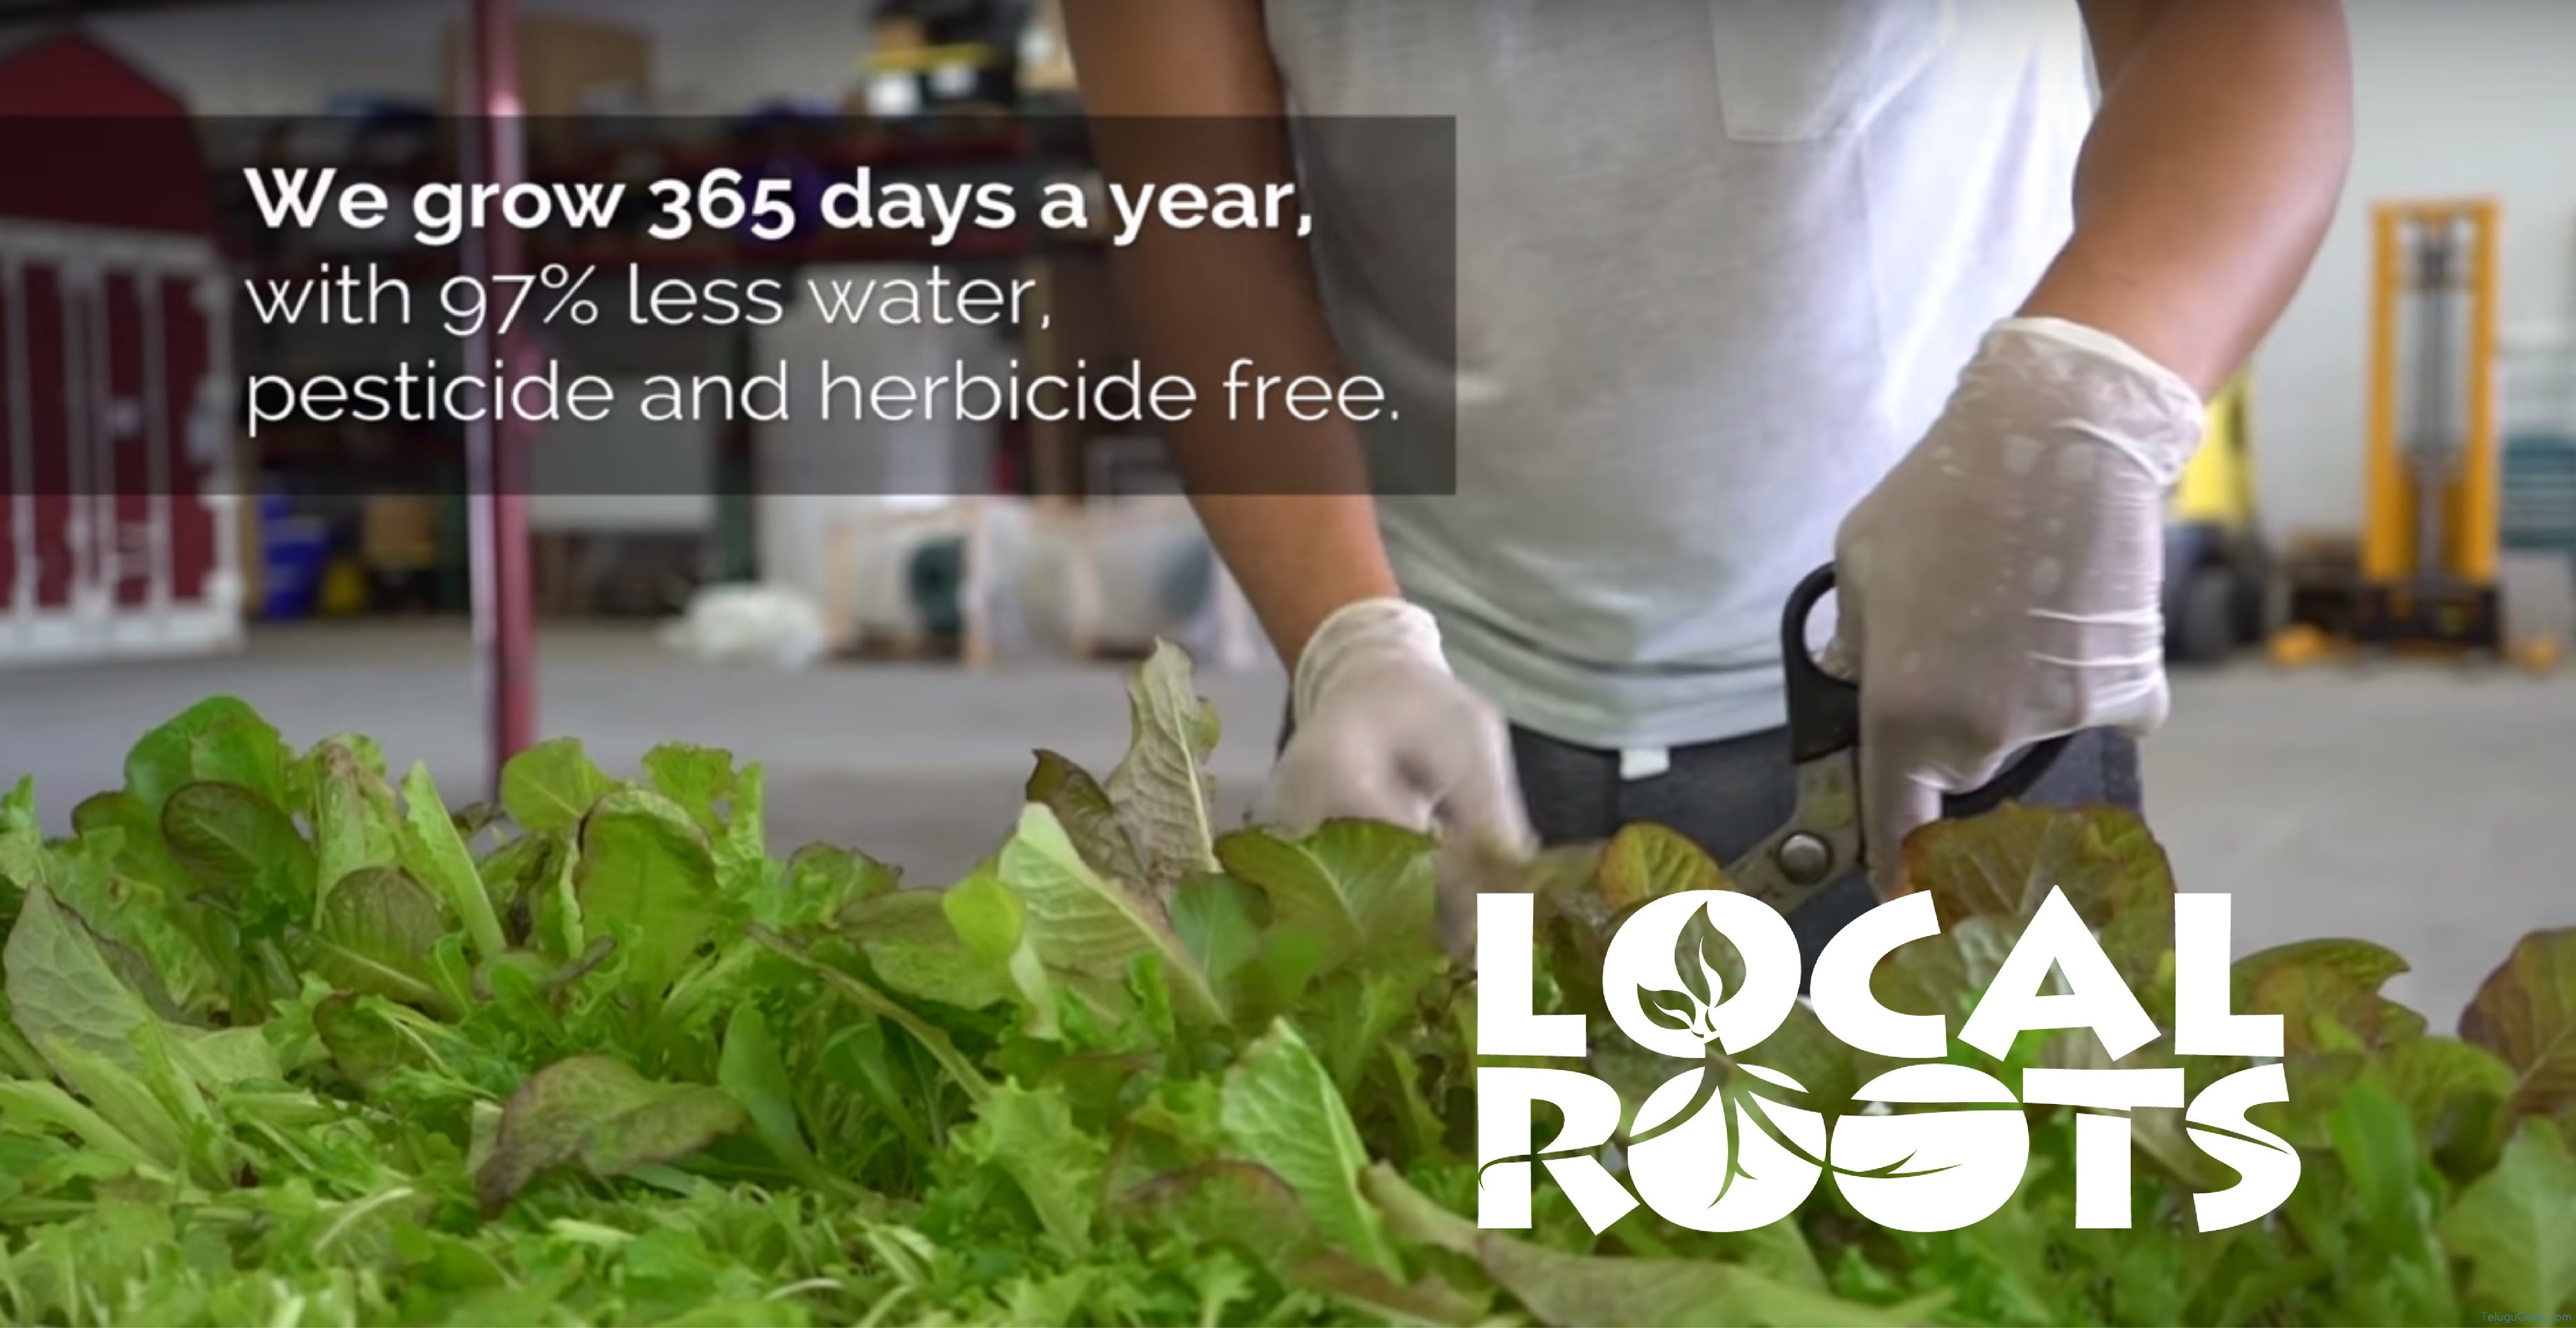 Local Roots: ఈ కొత్త రకం వ్యవసాయ పద్ధతిలో నేల మీద కాదు కంటైనర్లలో పంట పండిస్తారు